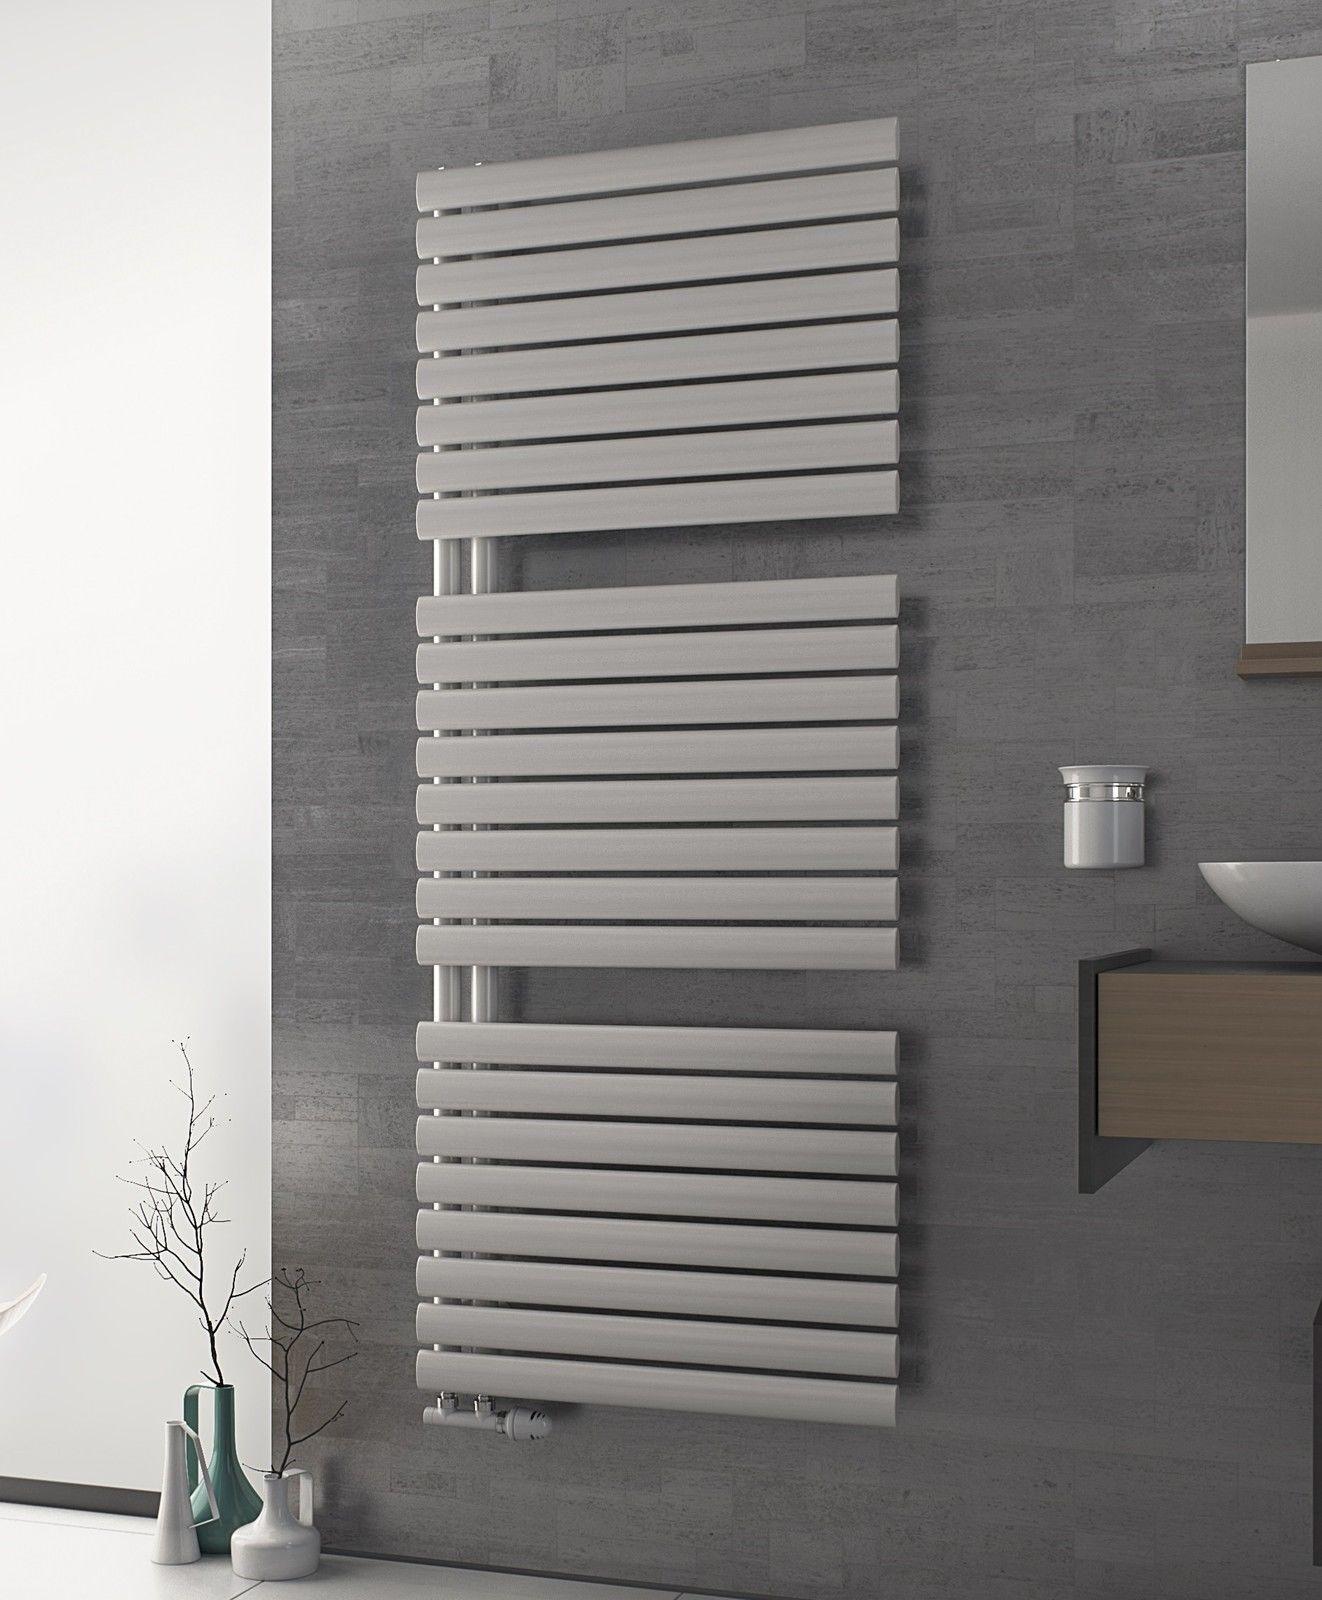 heizk rper mehr als 10000 angebote fotos preise seite 45. Black Bedroom Furniture Sets. Home Design Ideas